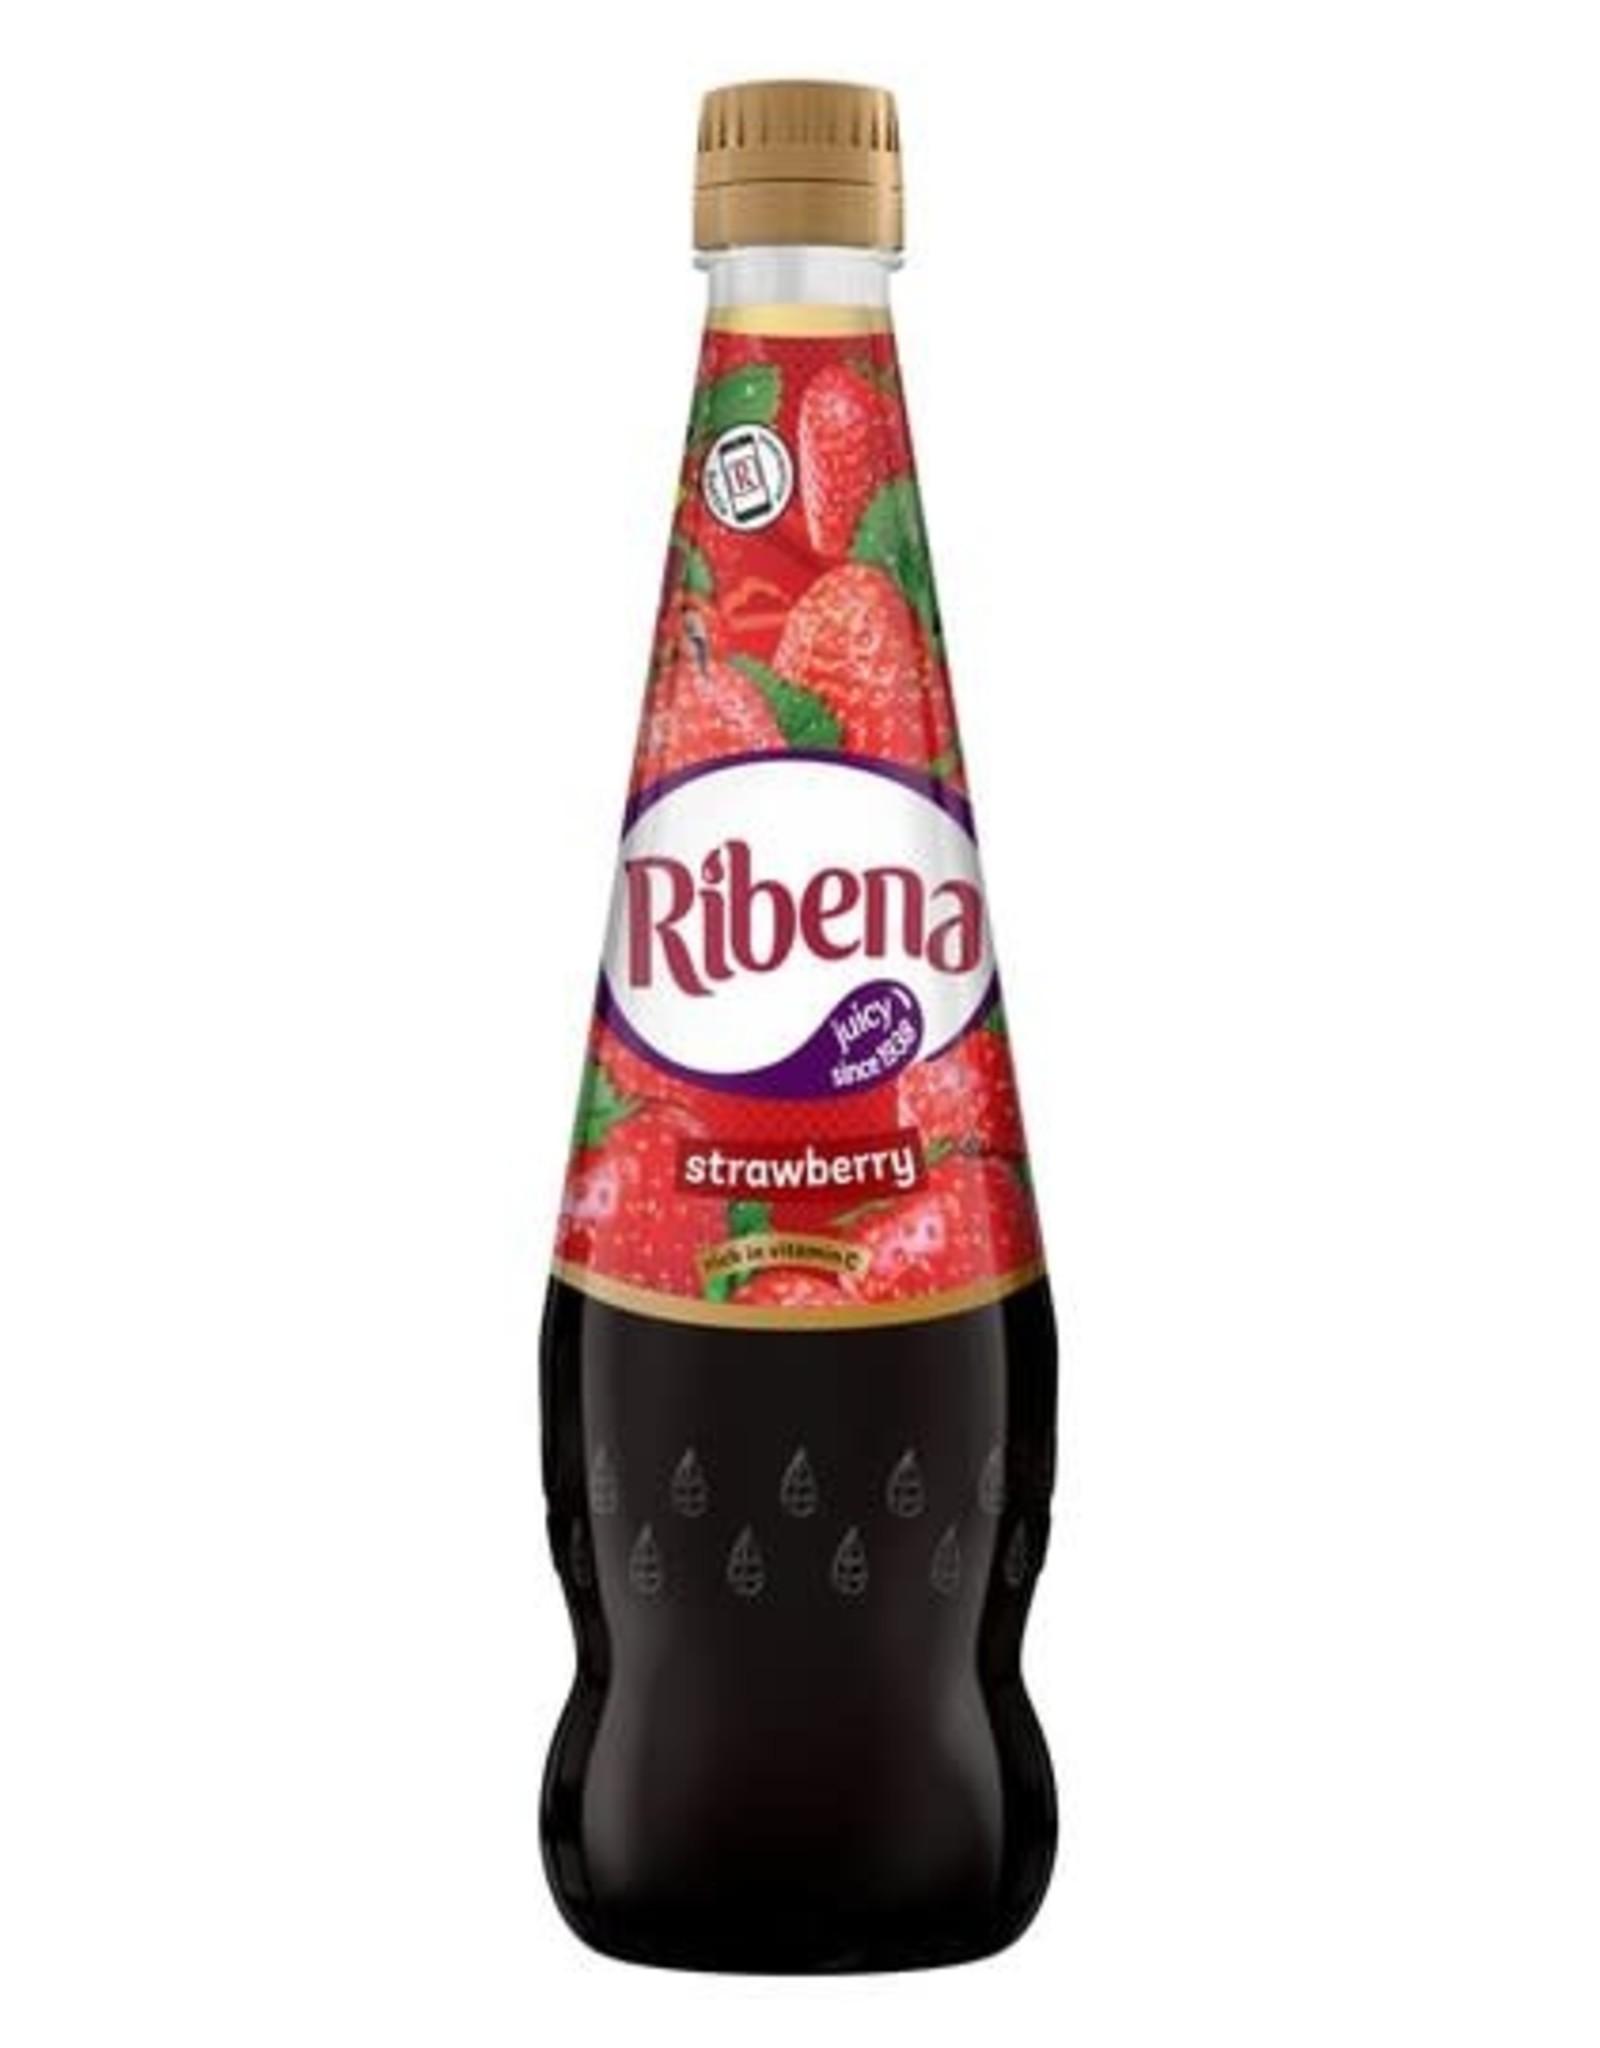 Ribena Ribena strawberry 850 ml